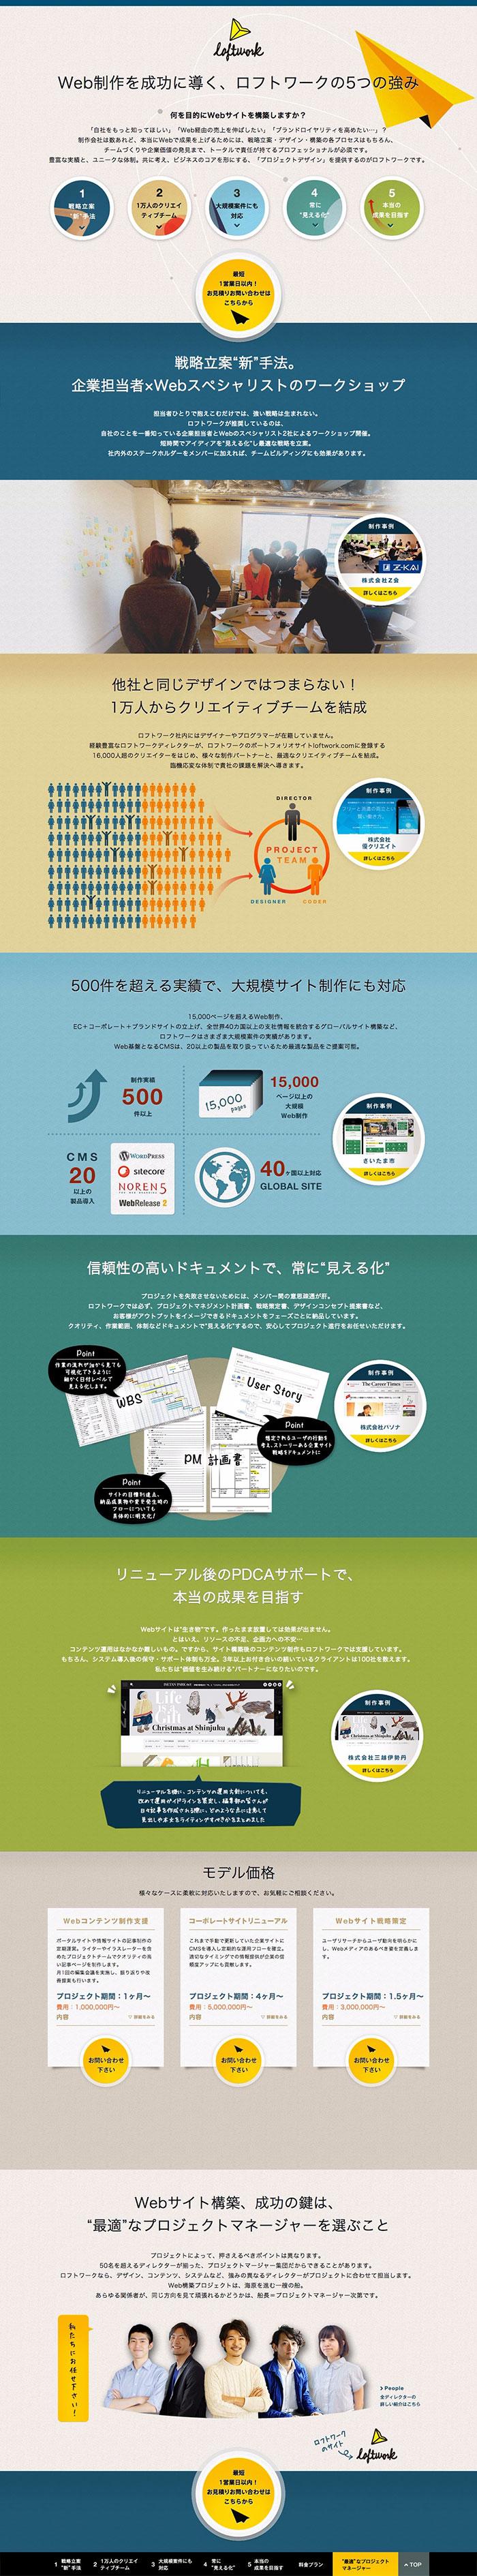 03-loftwork-jp-lp_web-1456556046668